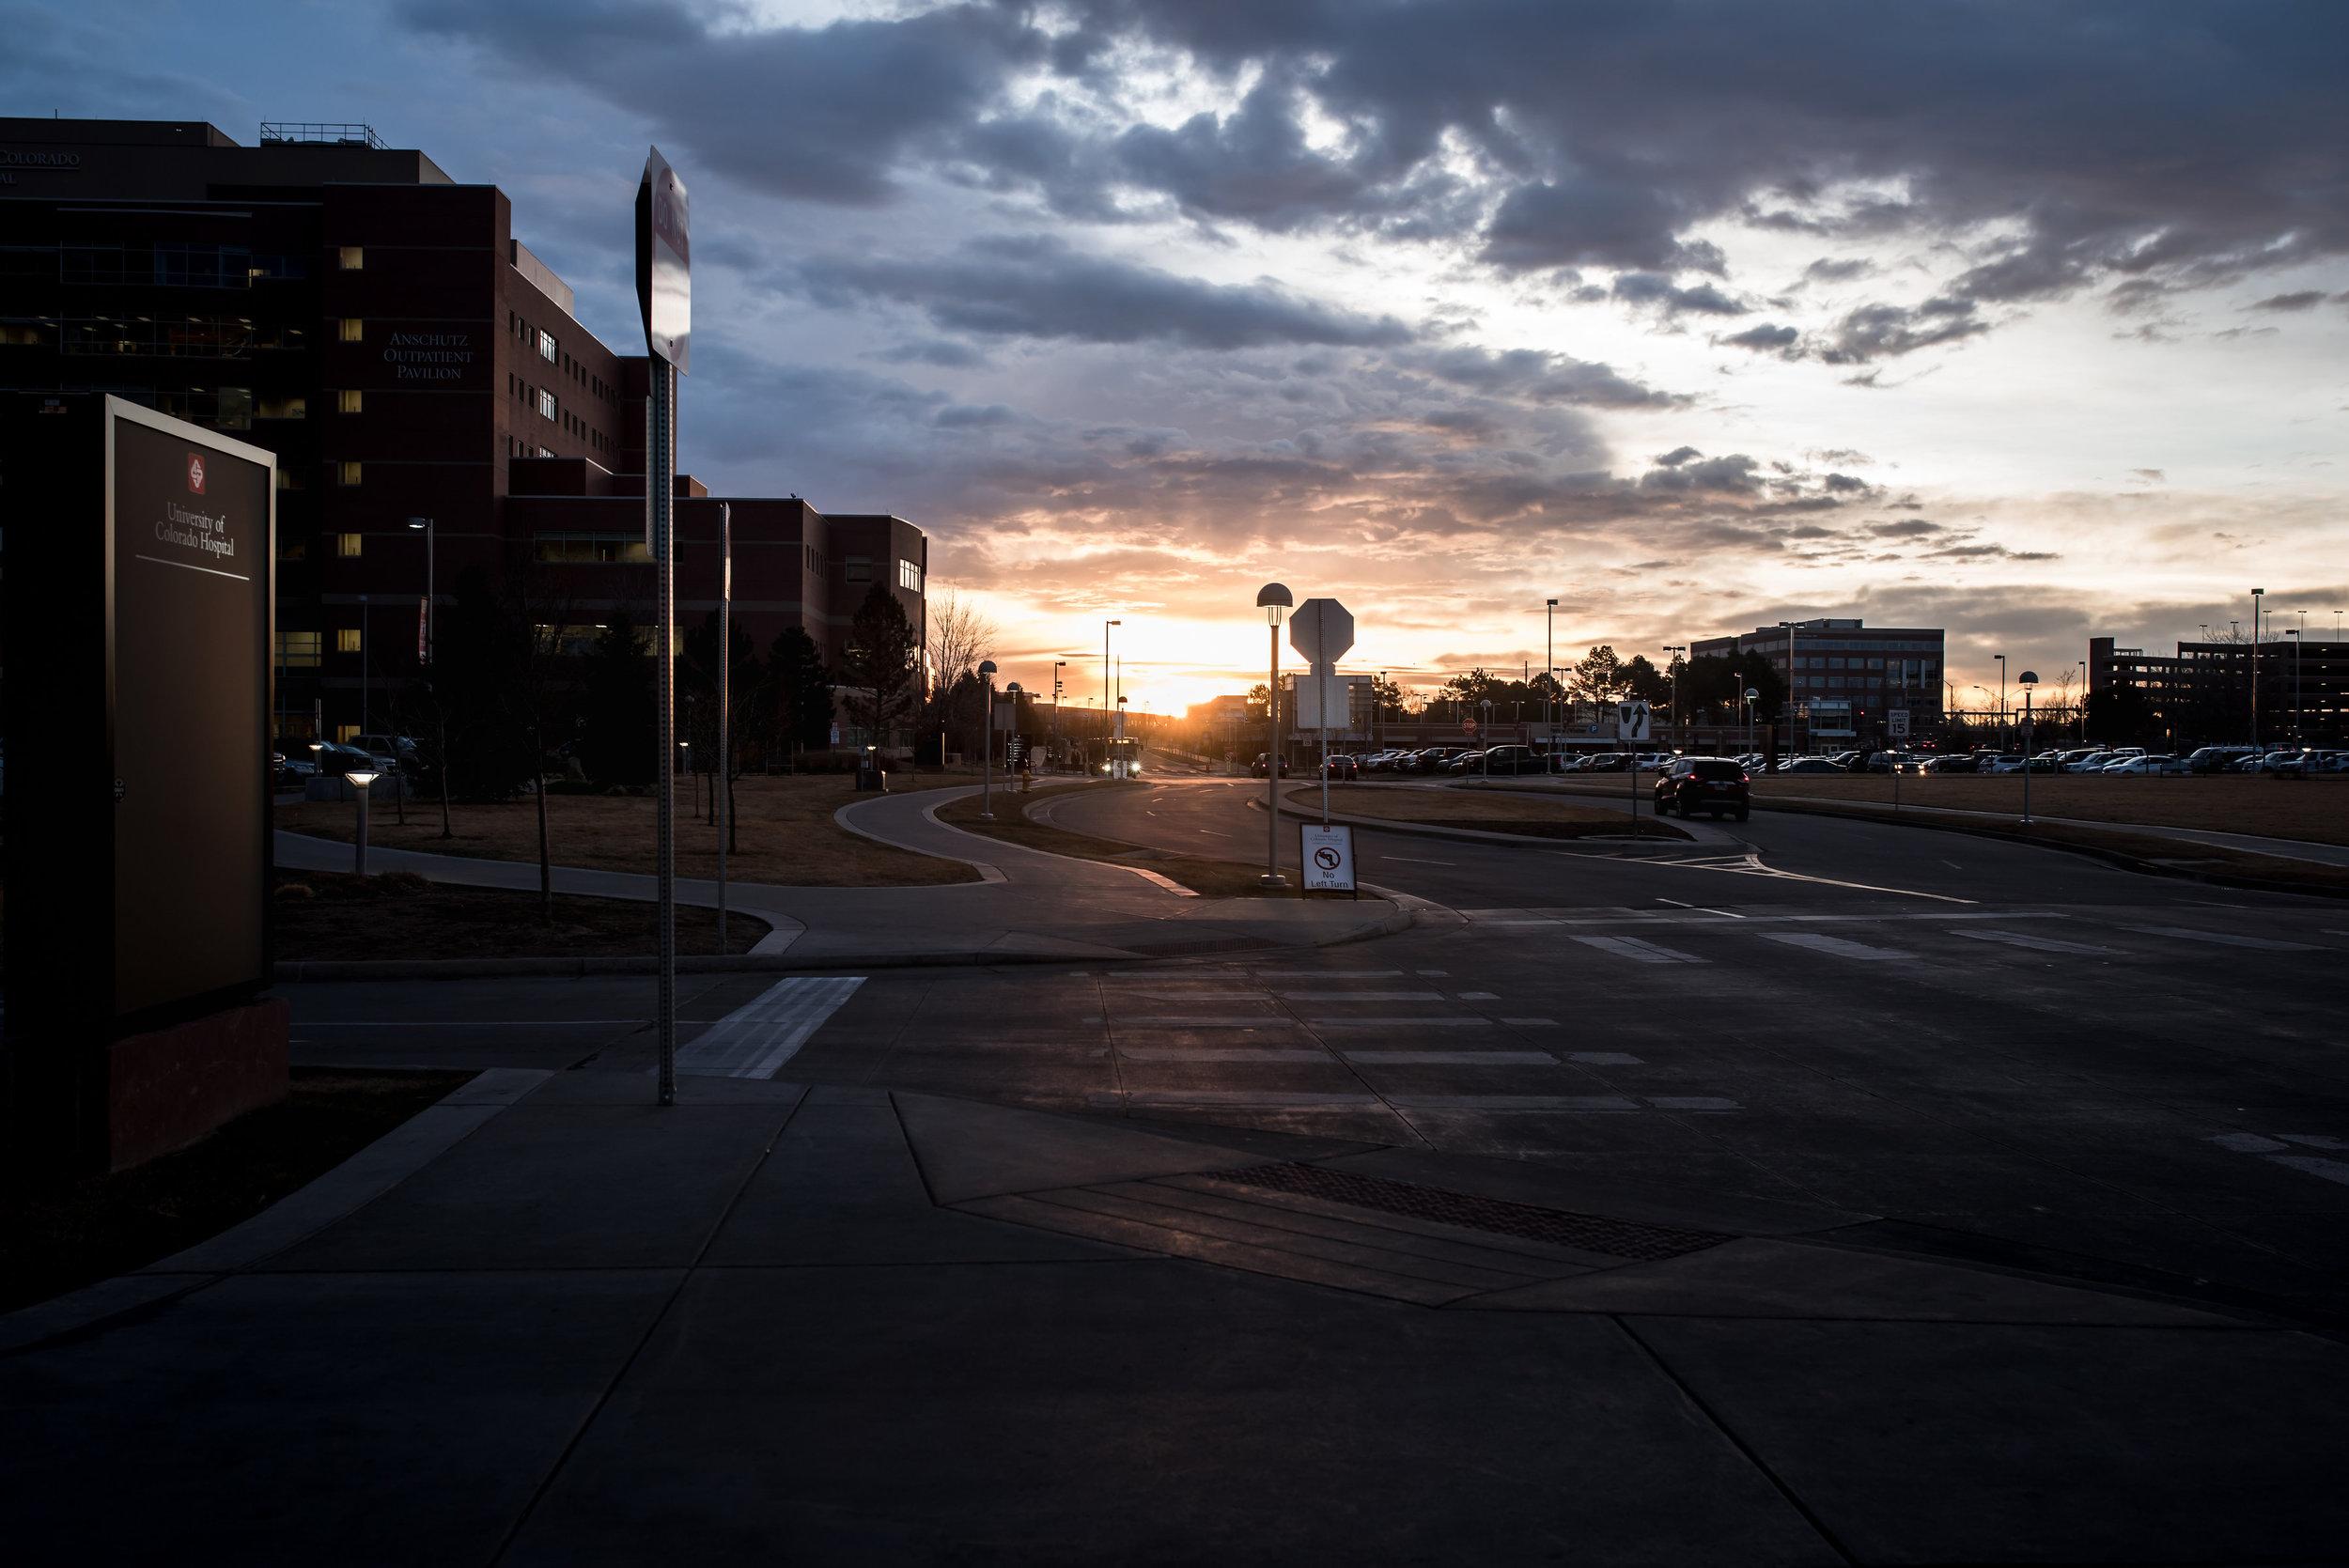 University-colorado-early-morning